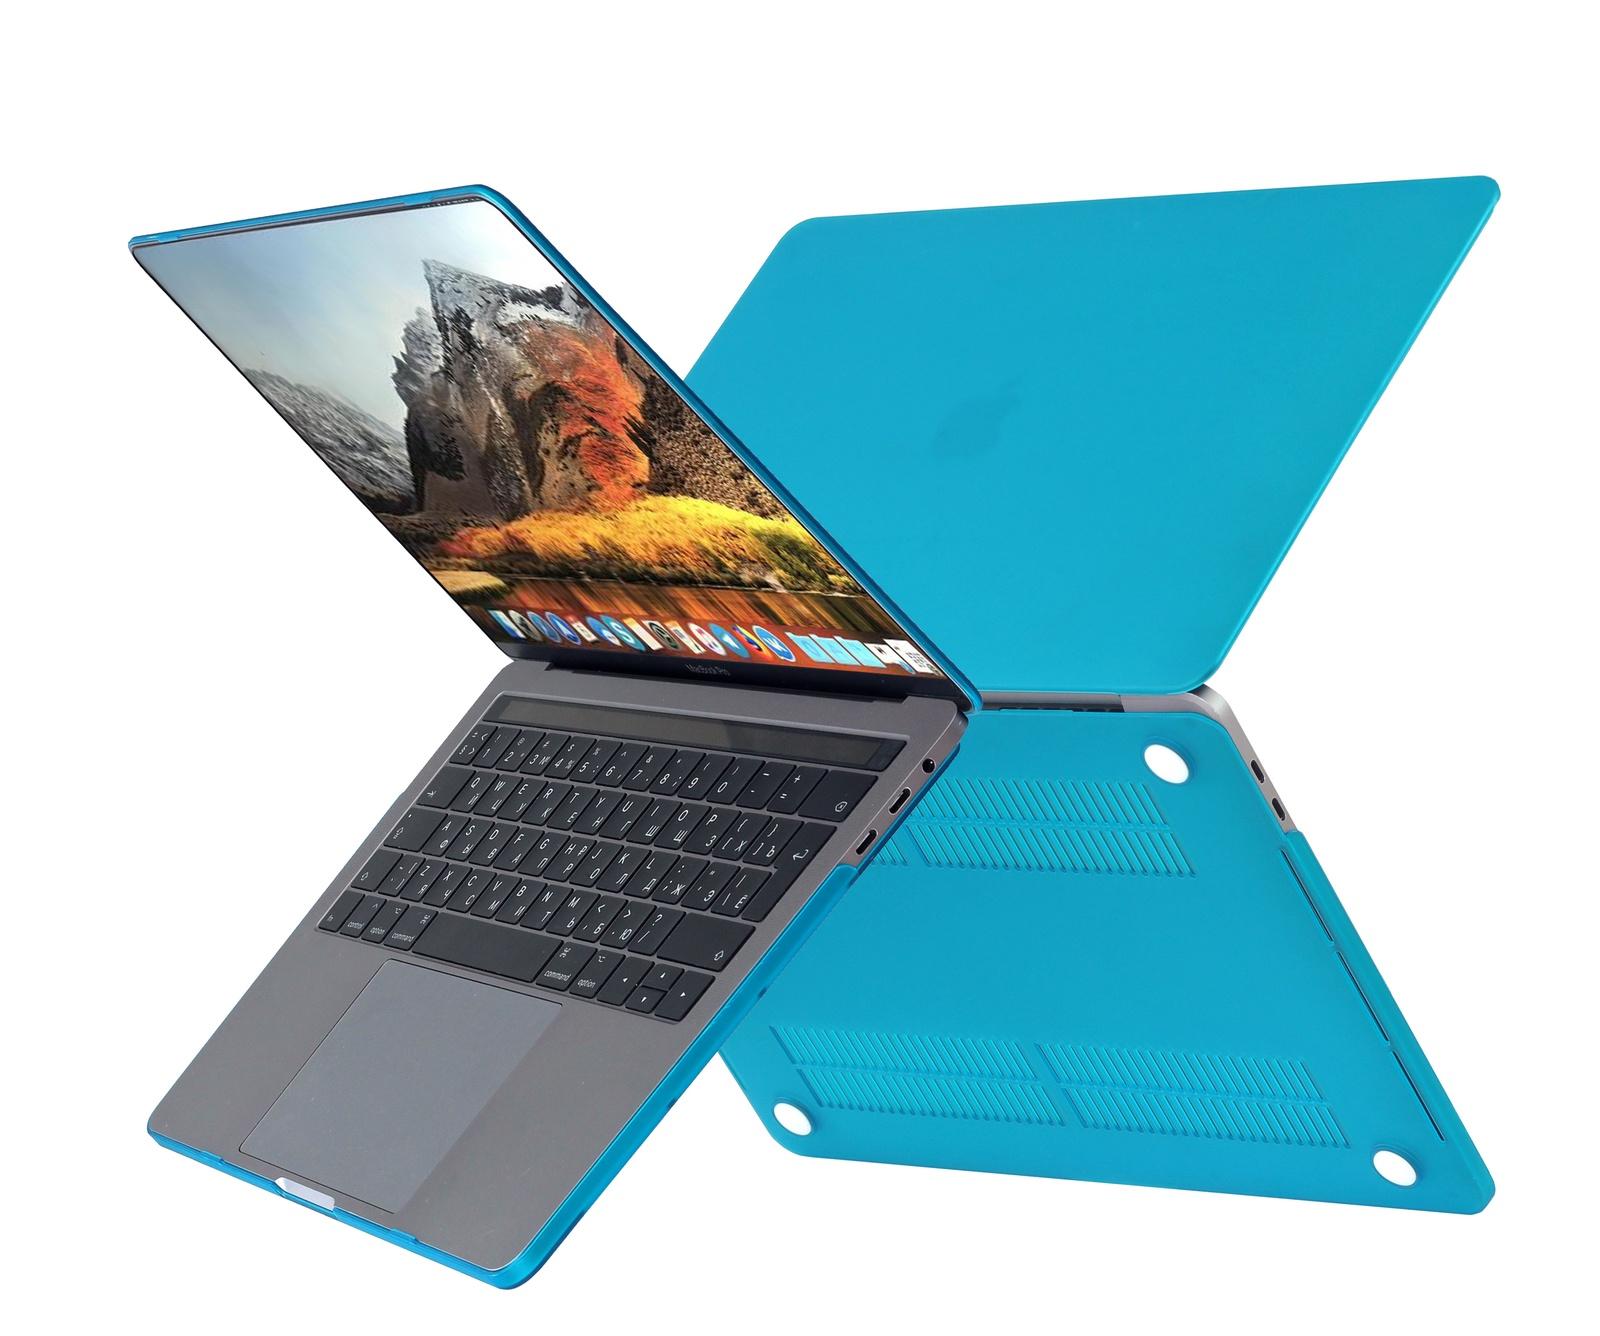 Чехол HardShell Case для Macbook 12, голубой